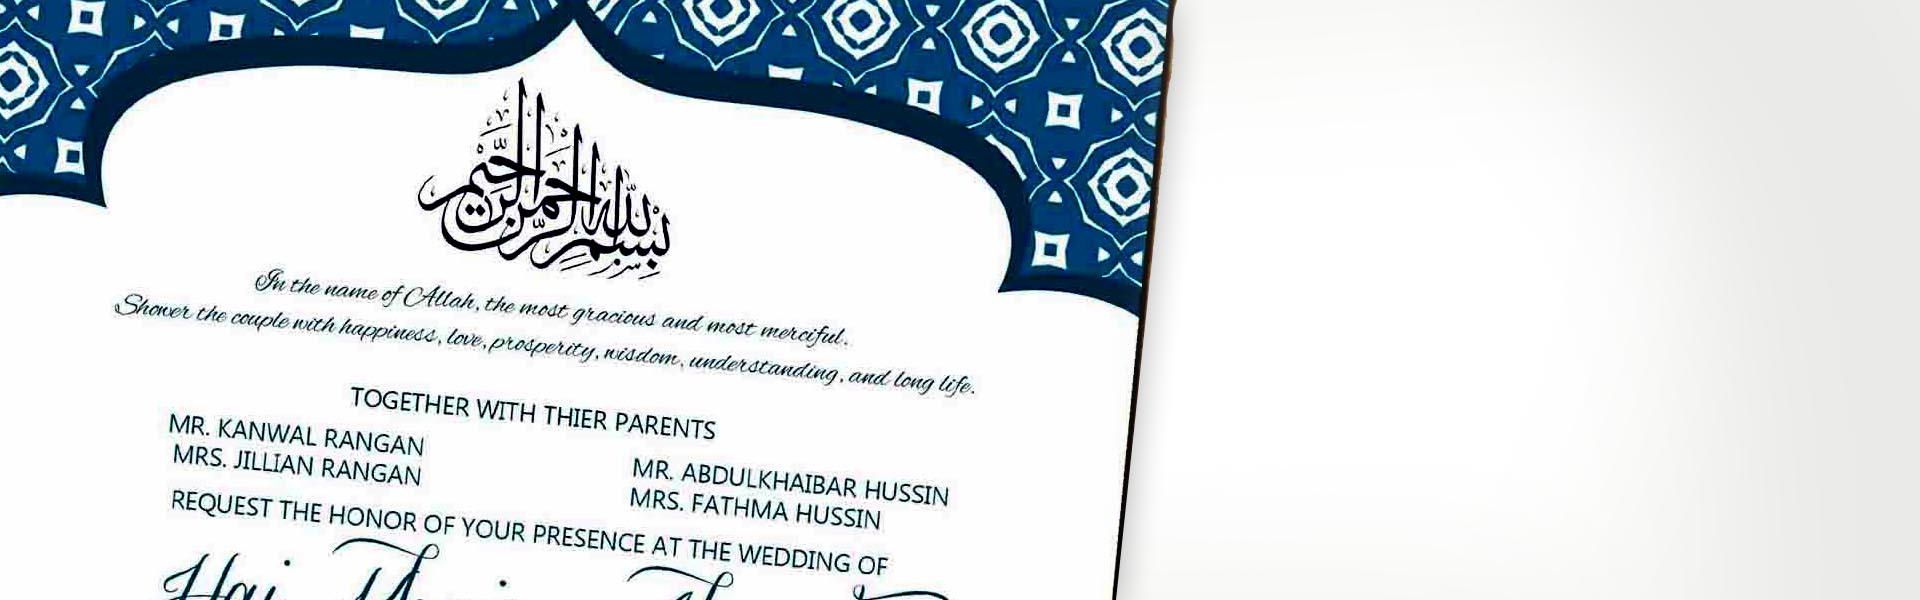 Paras Traders Bharuch Gujarat India Invitation Card